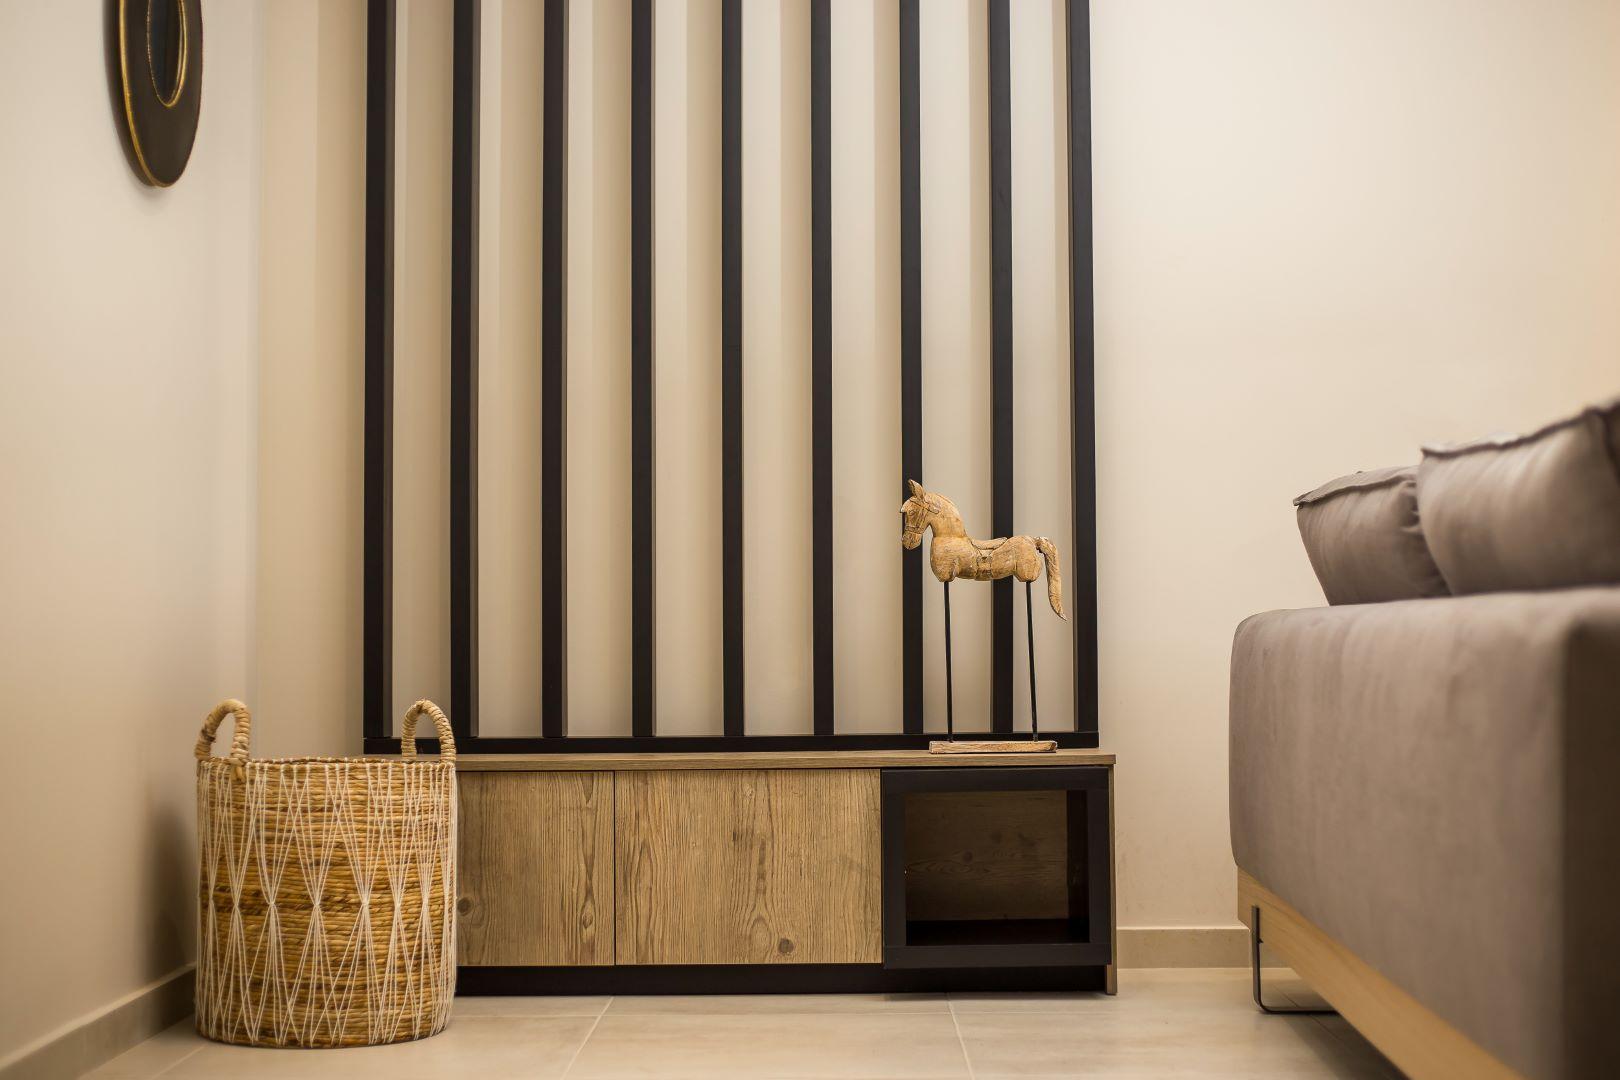 Venezia-Luxury-Living-villas-at-Faliraki-Rhodes-Greece-5